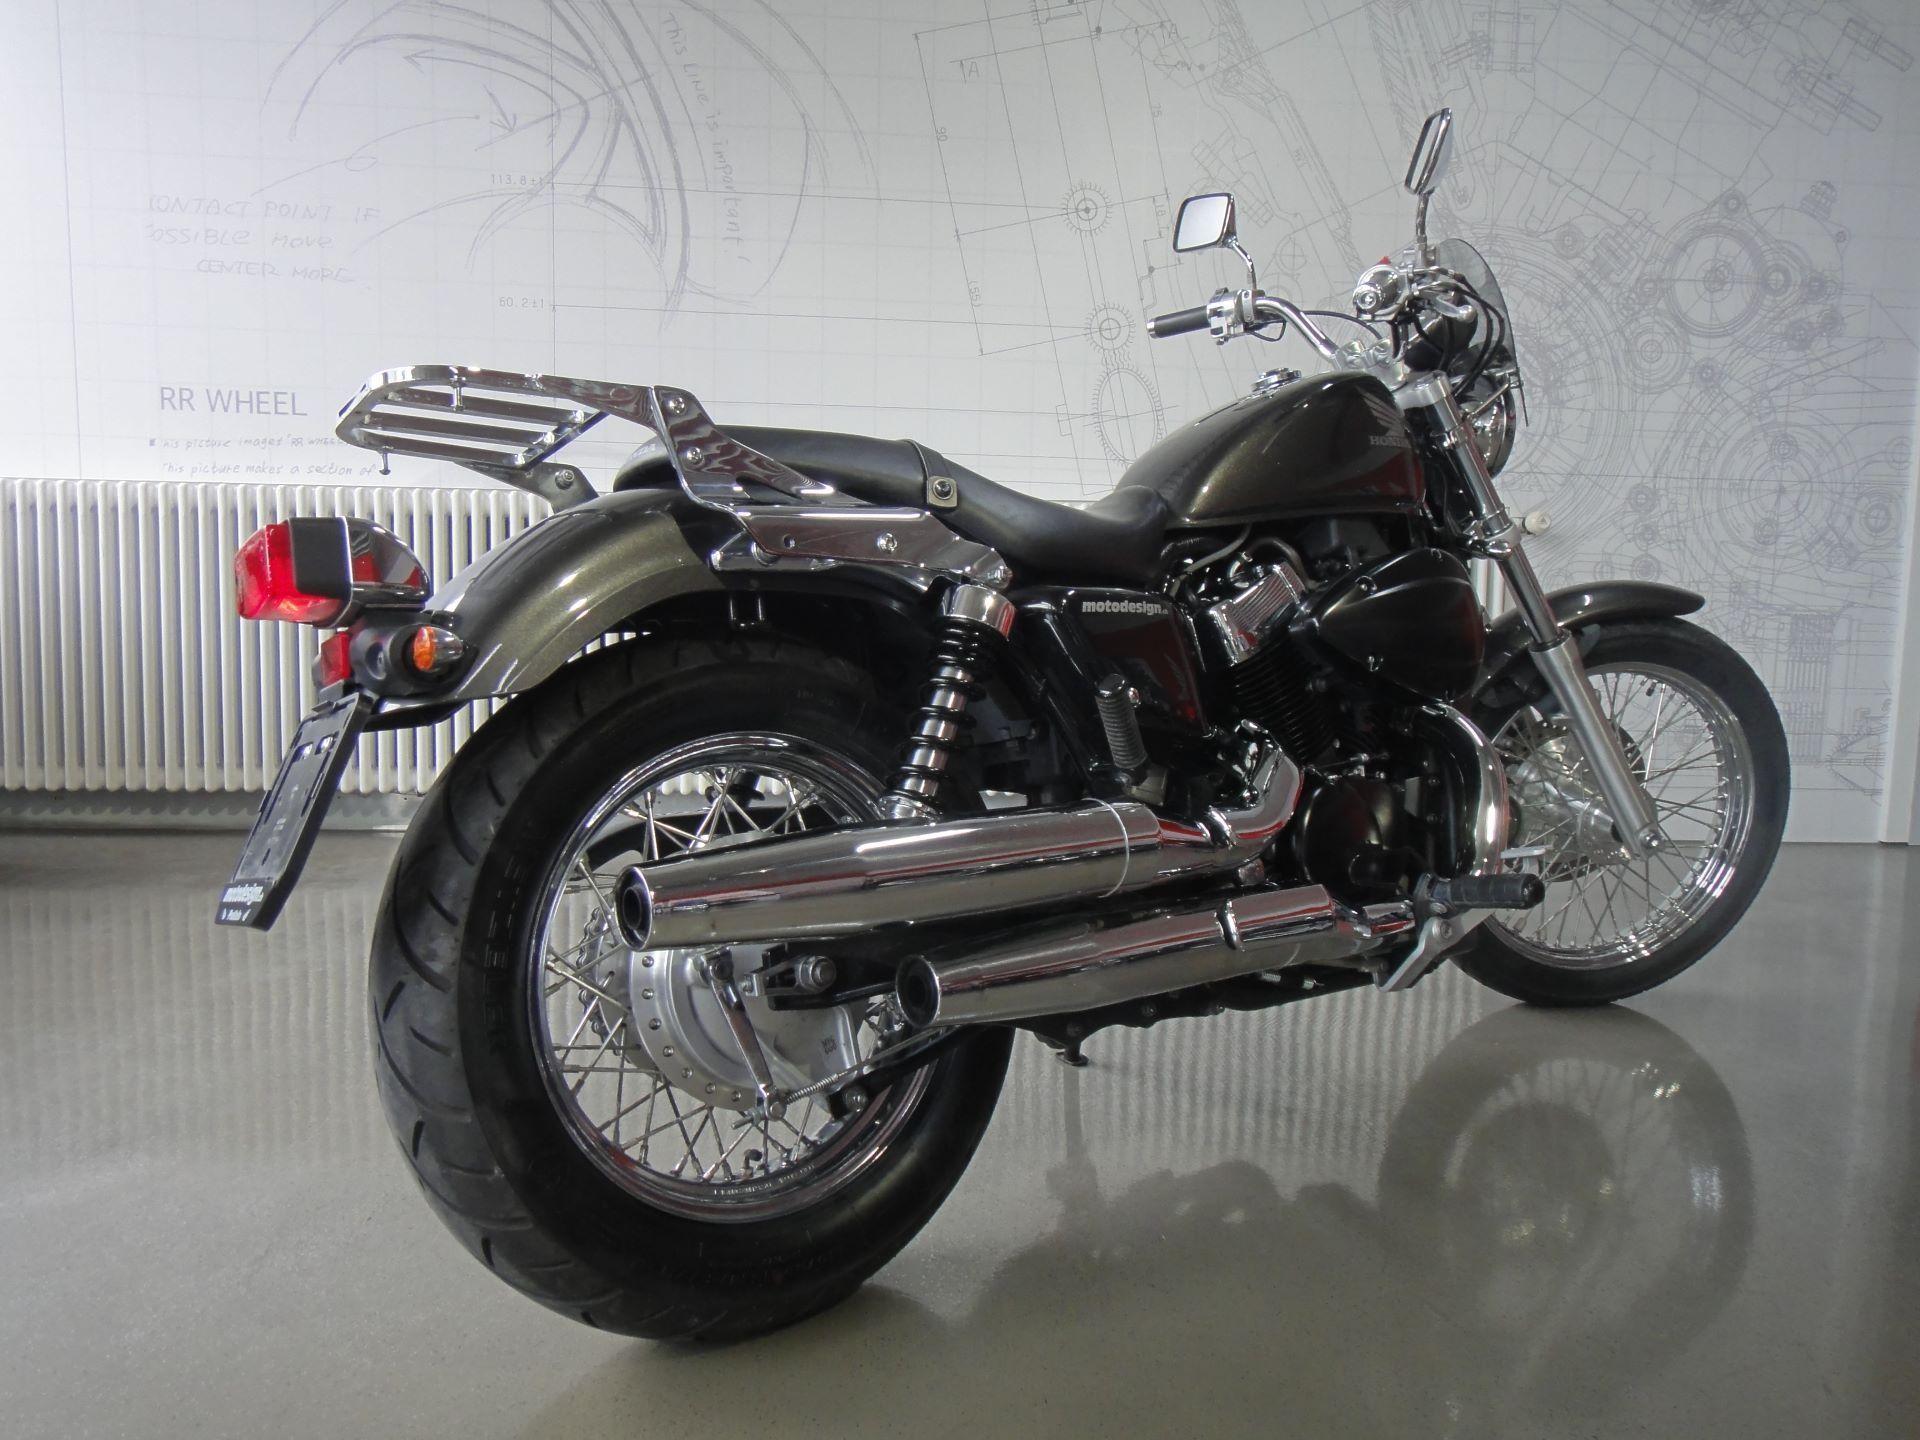 moto occasioni acquistare honda vt 750 s motodesign ag pratteln. Black Bedroom Furniture Sets. Home Design Ideas